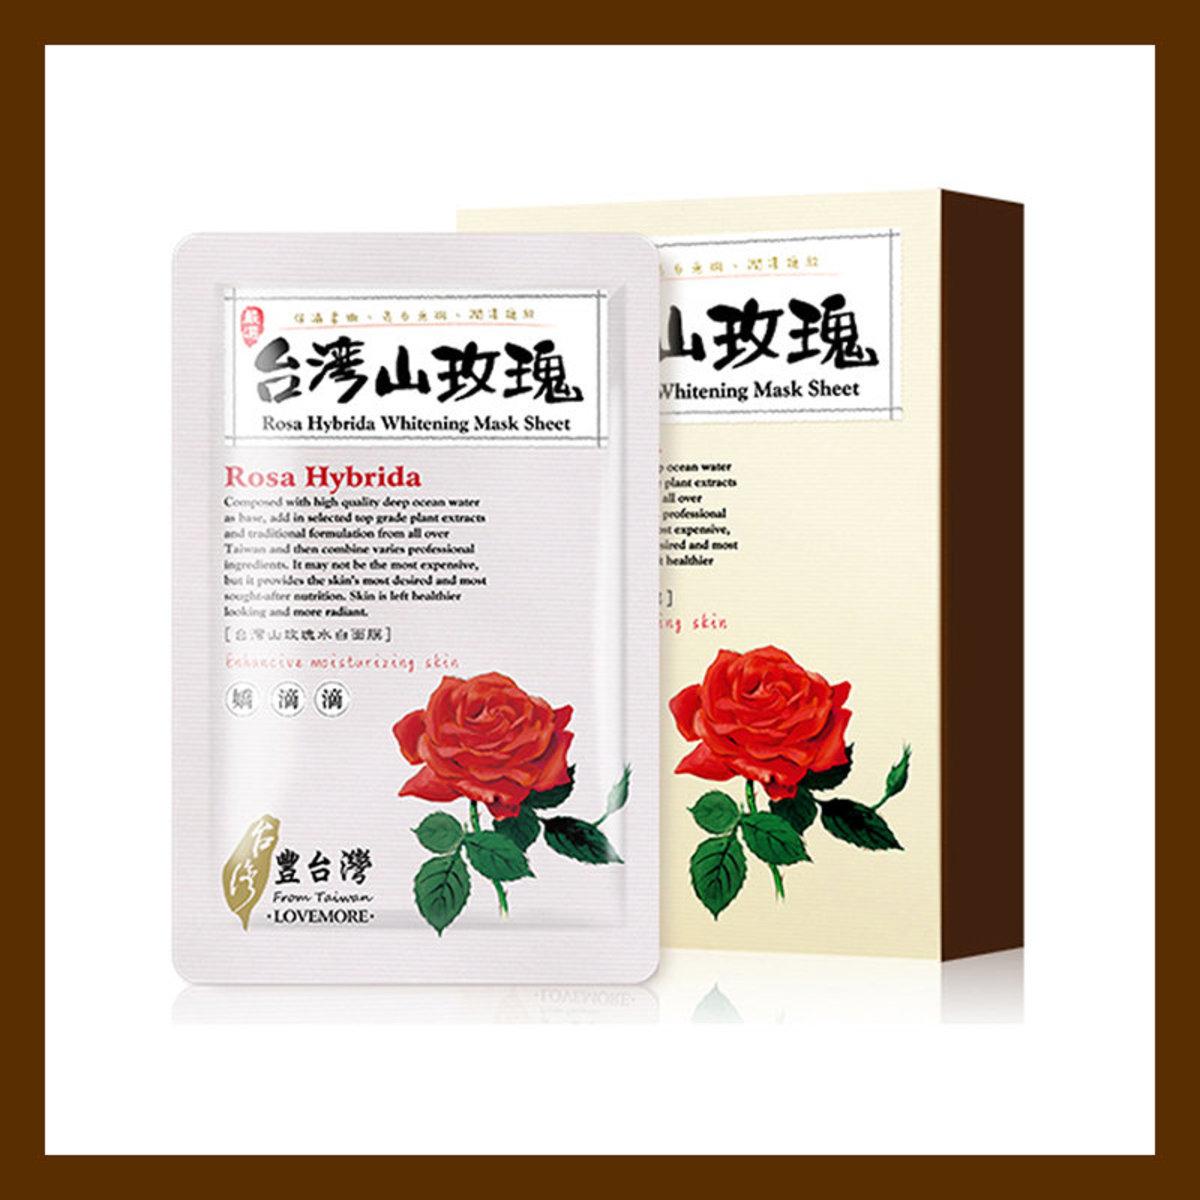 LOVEMORE 愛戀膜法 豐台灣 台灣 (1盒5片)水白 玫瑰面膜(4710155270970)